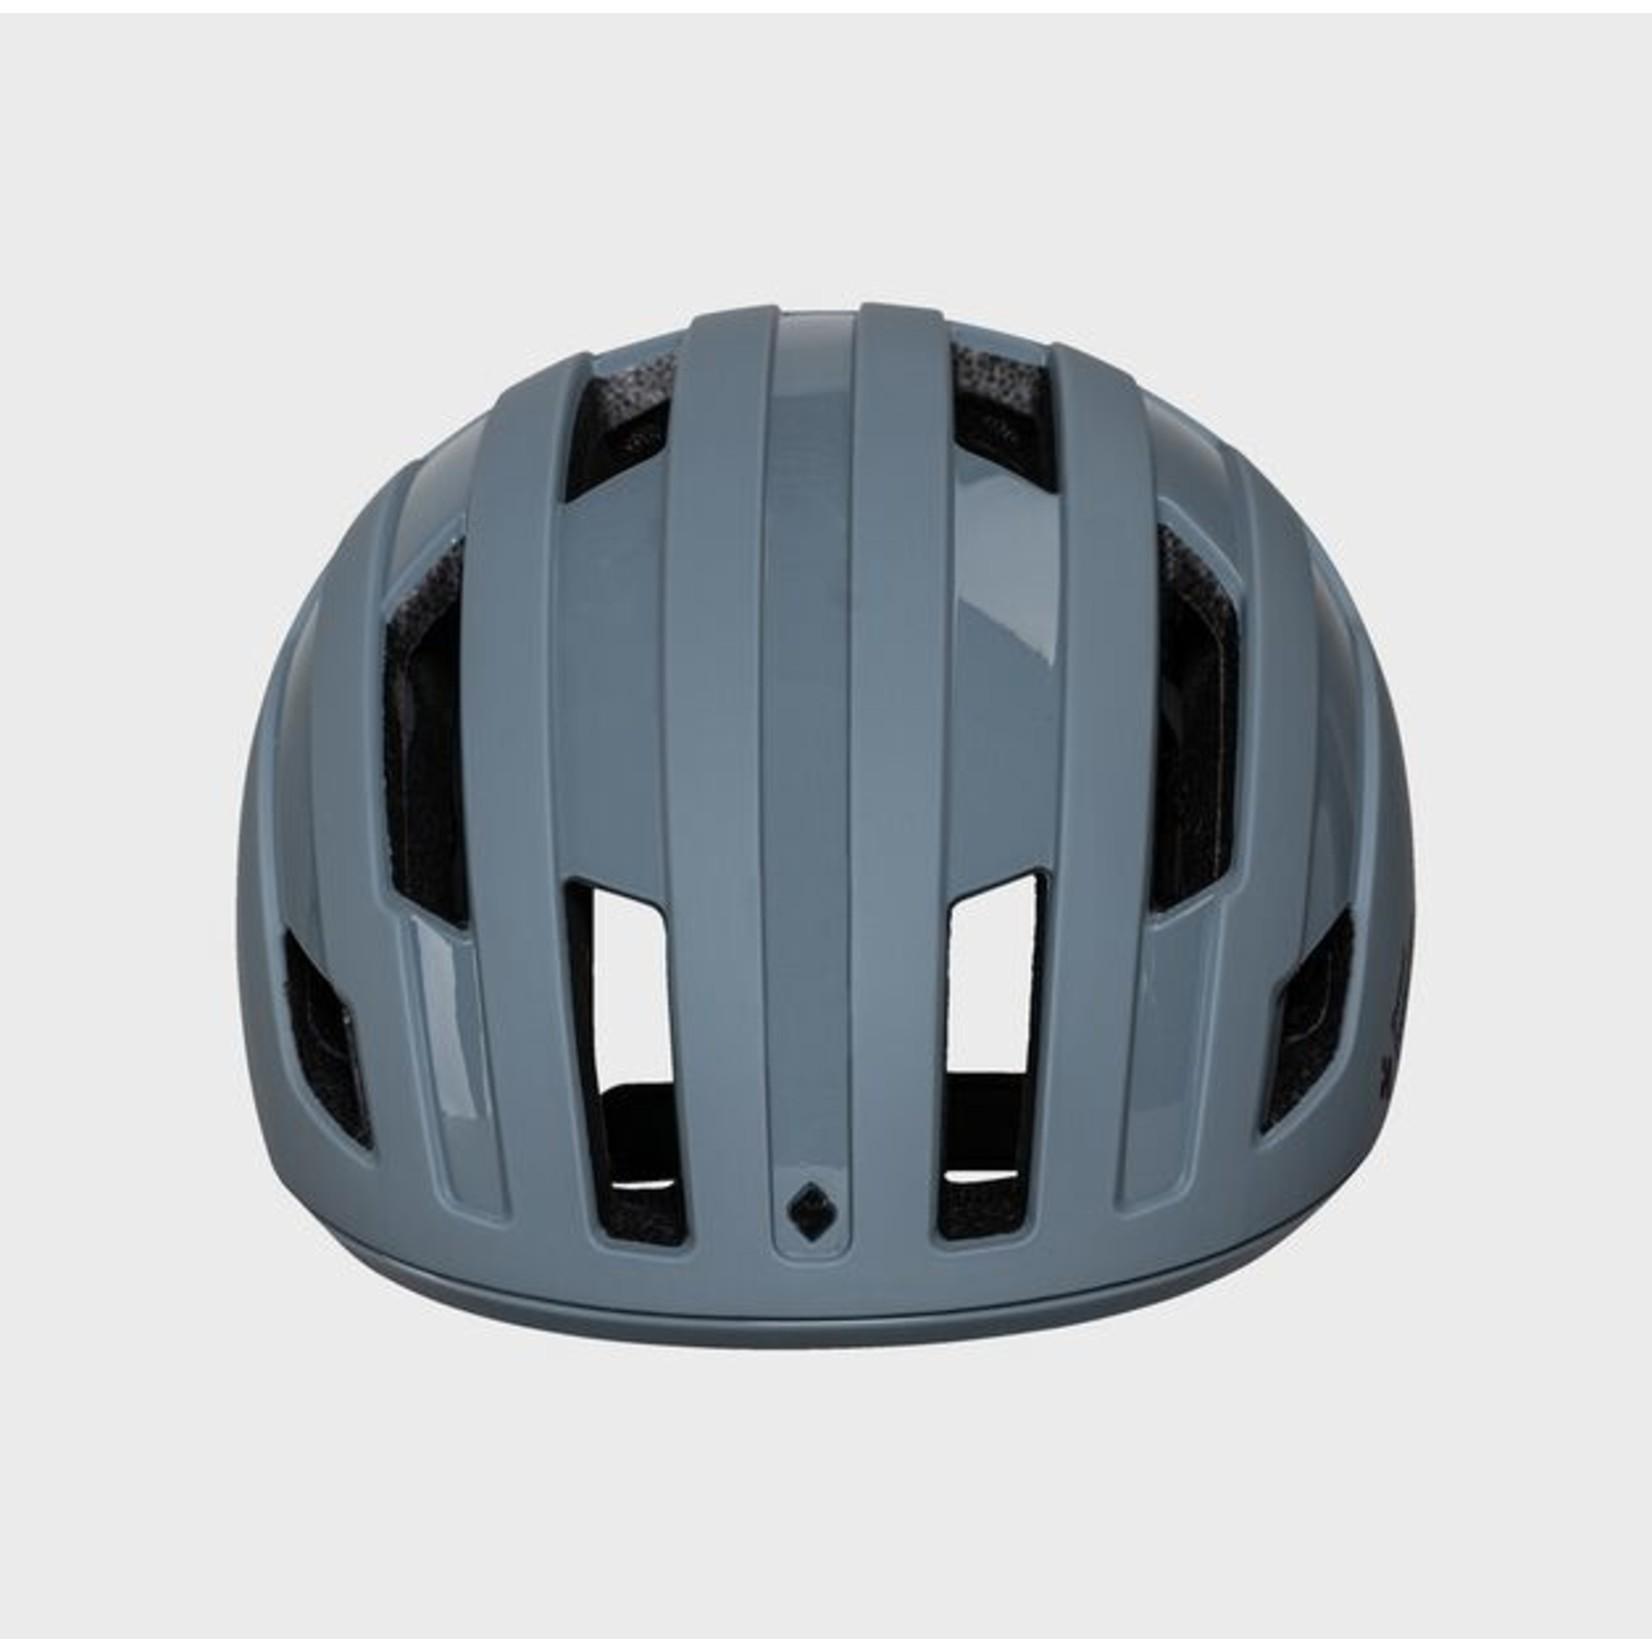 Sweet Protection Sweet Protection Outrider MIPS Helmet - Matt Nardo Grey